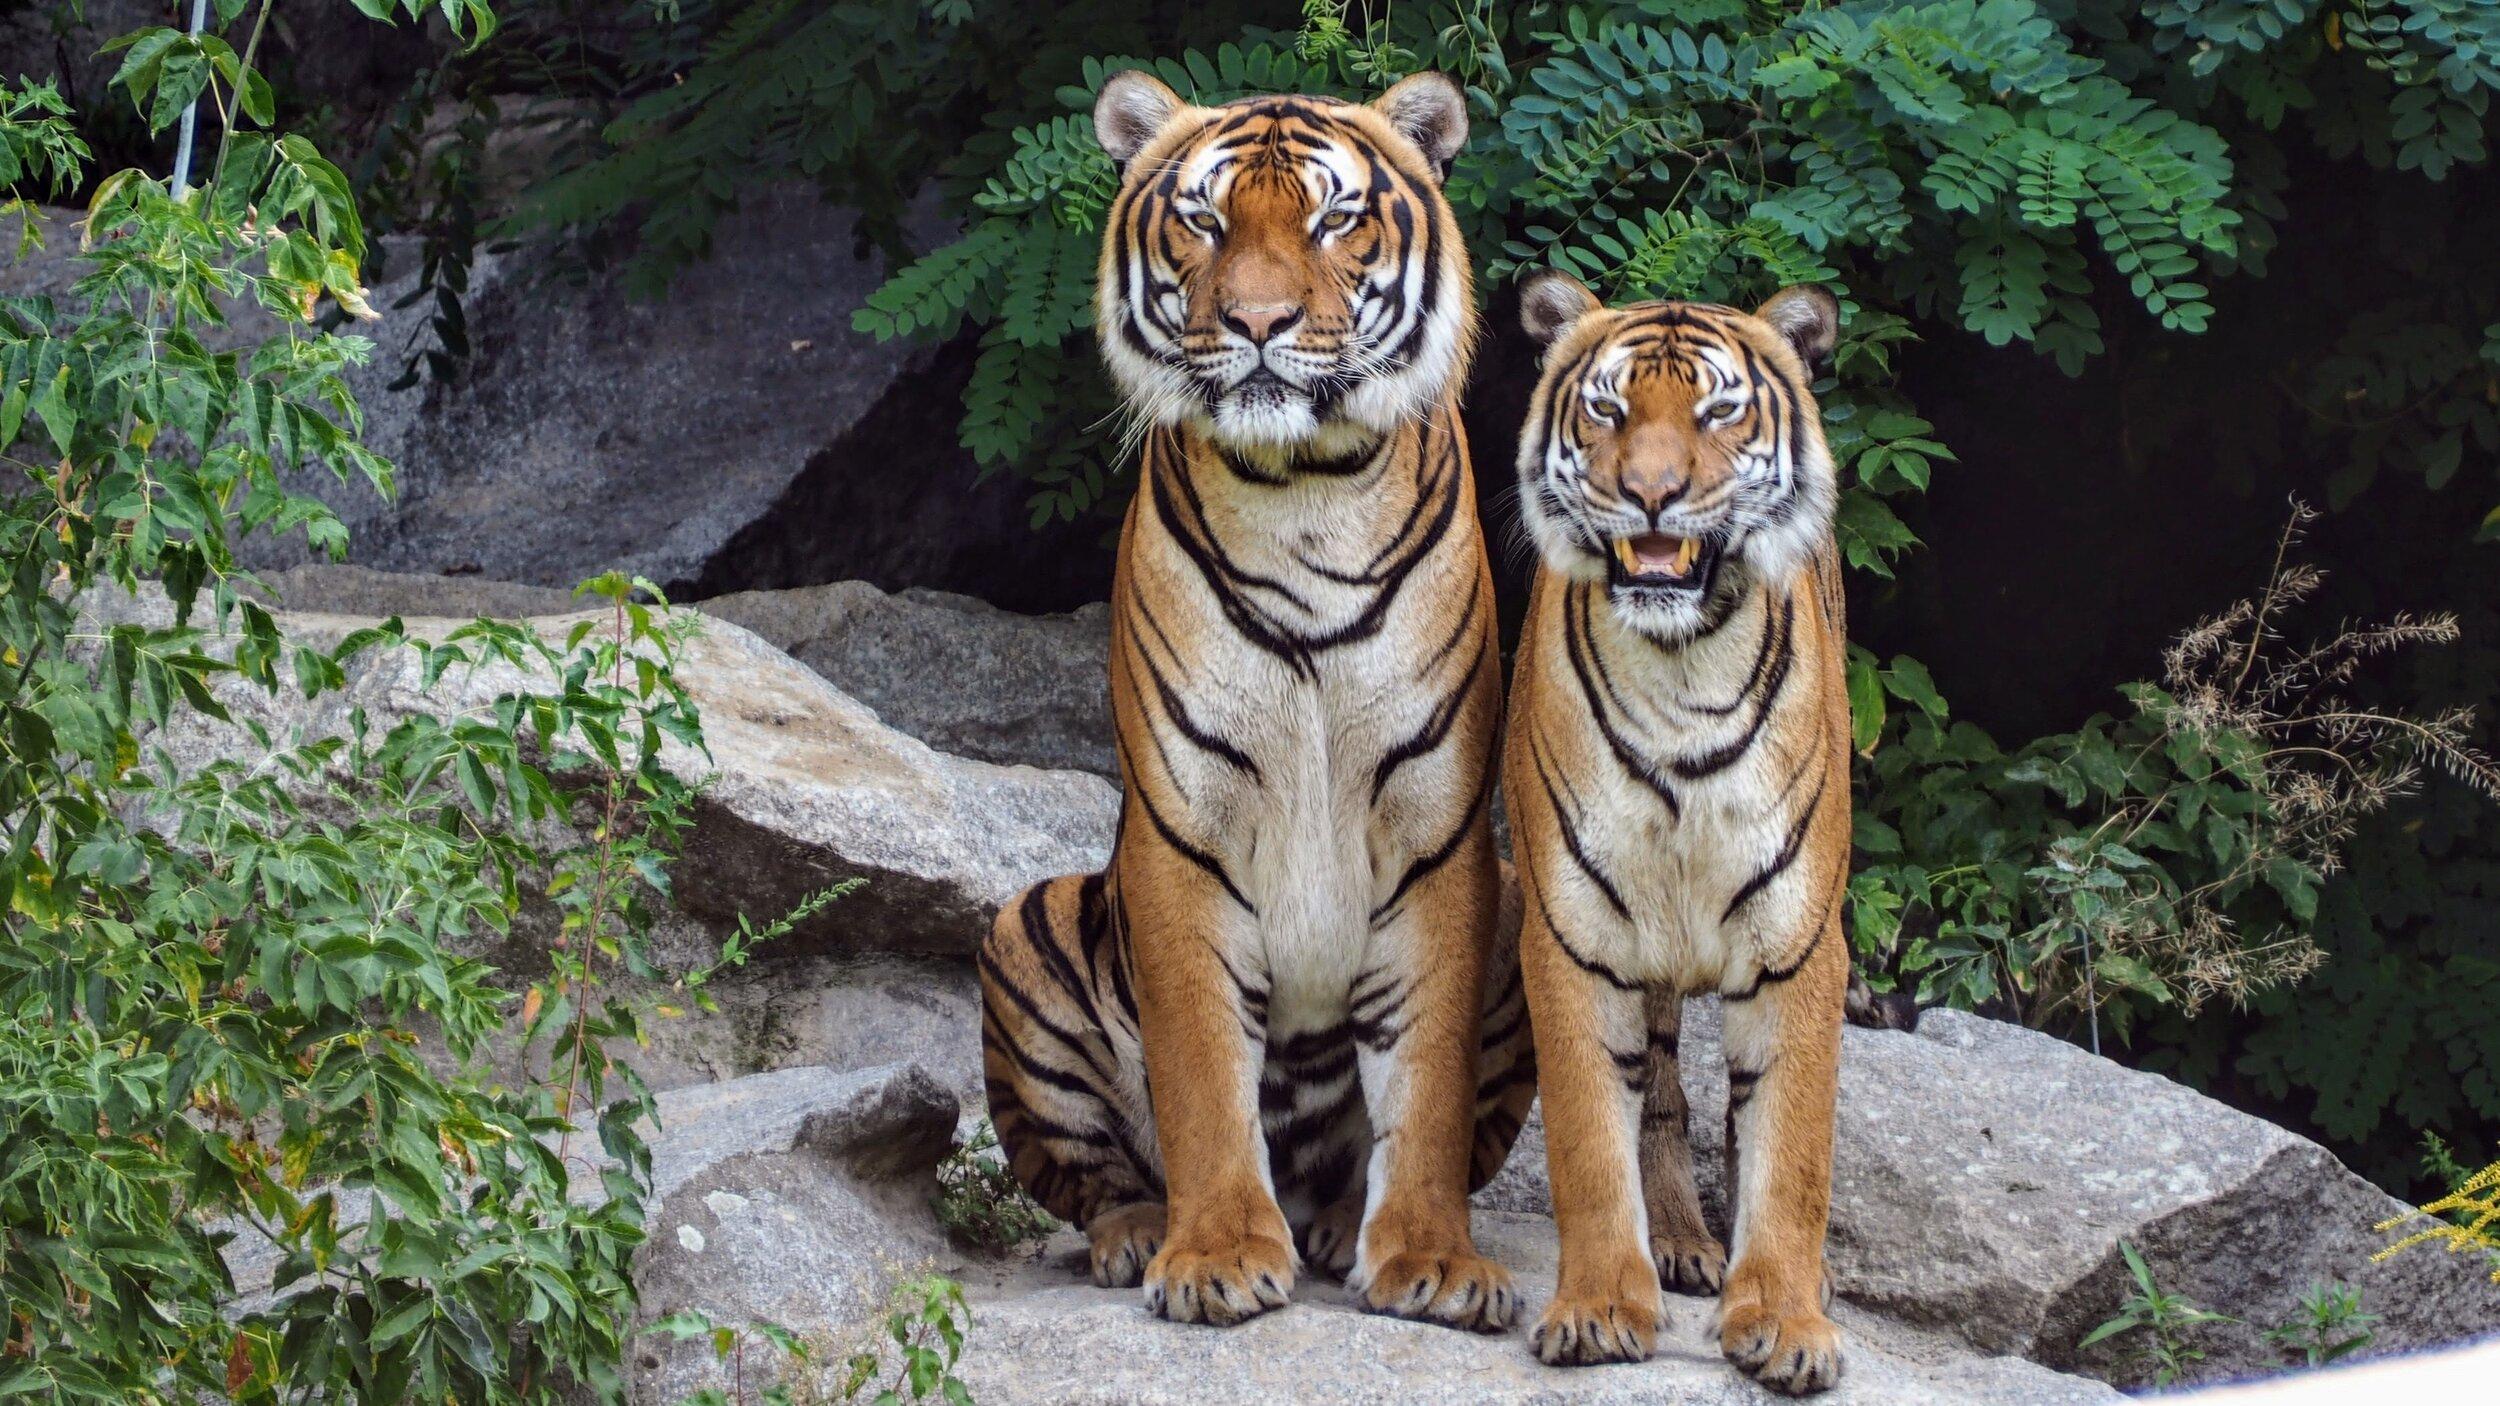 animal-park-animal-photography-animals-814898.jpg